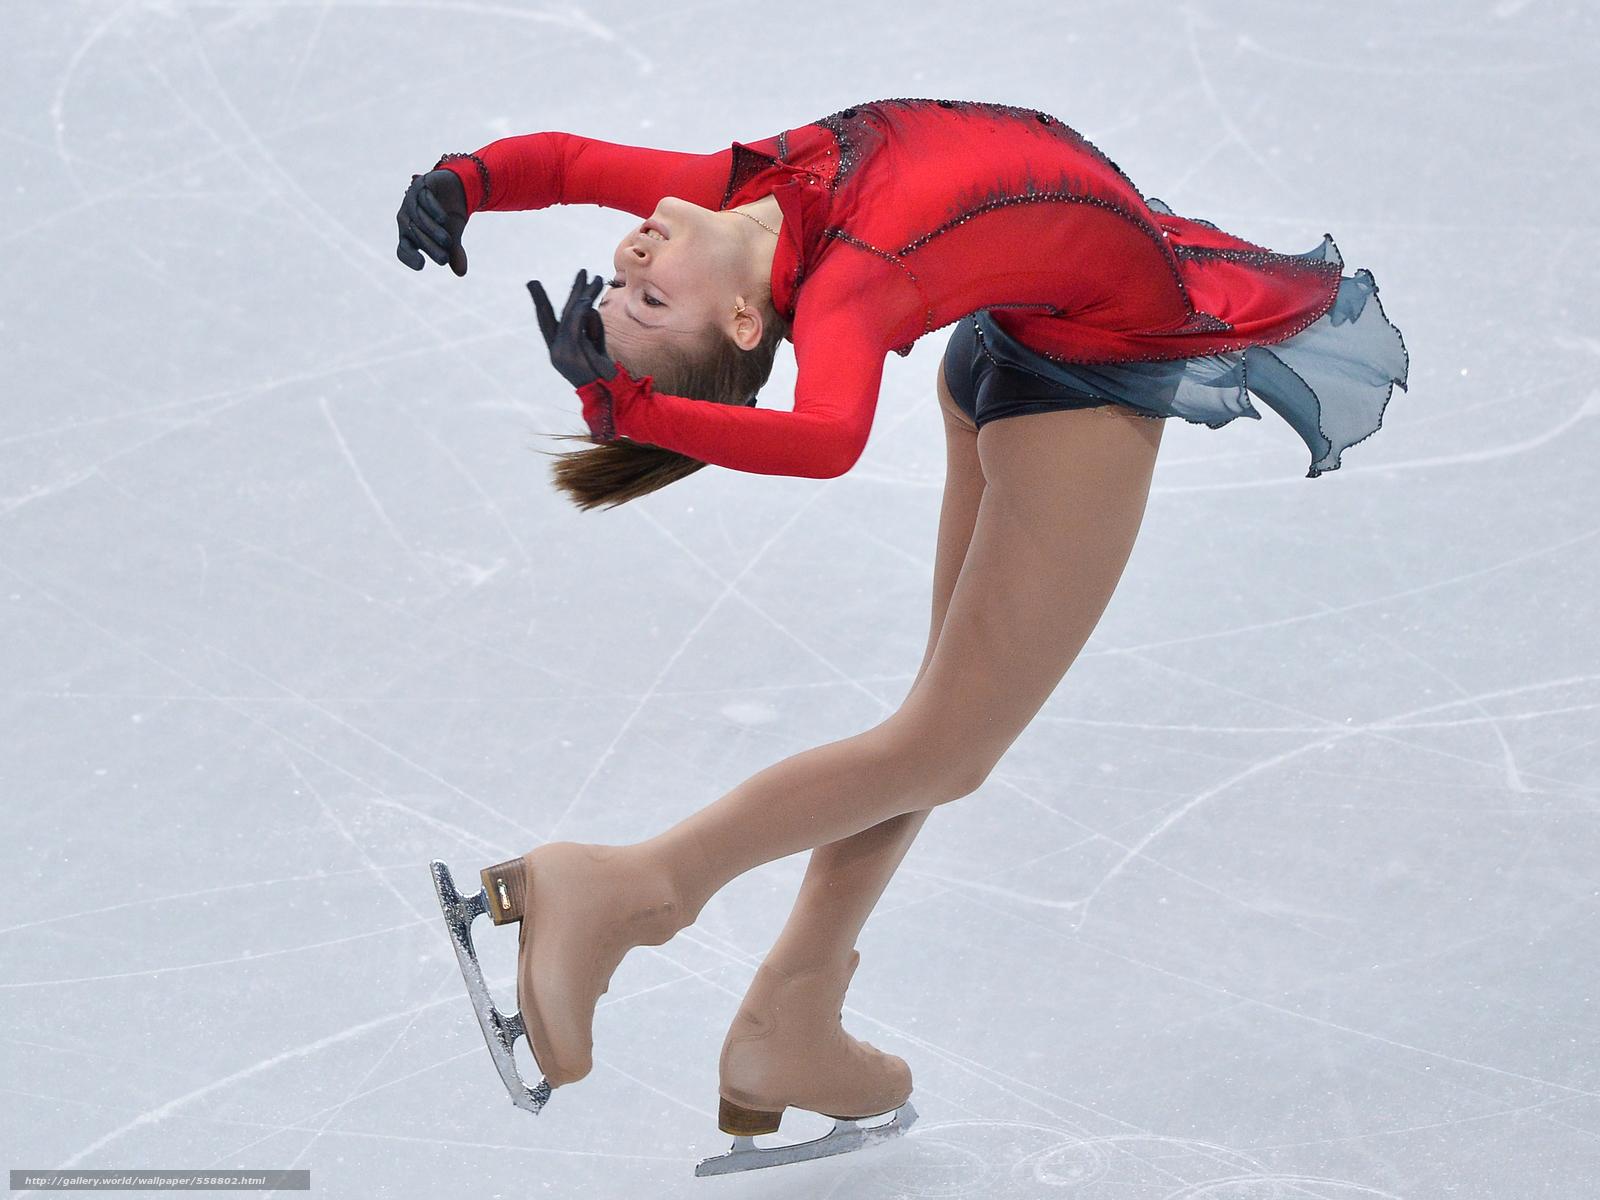 ice skating desktop wallpaper